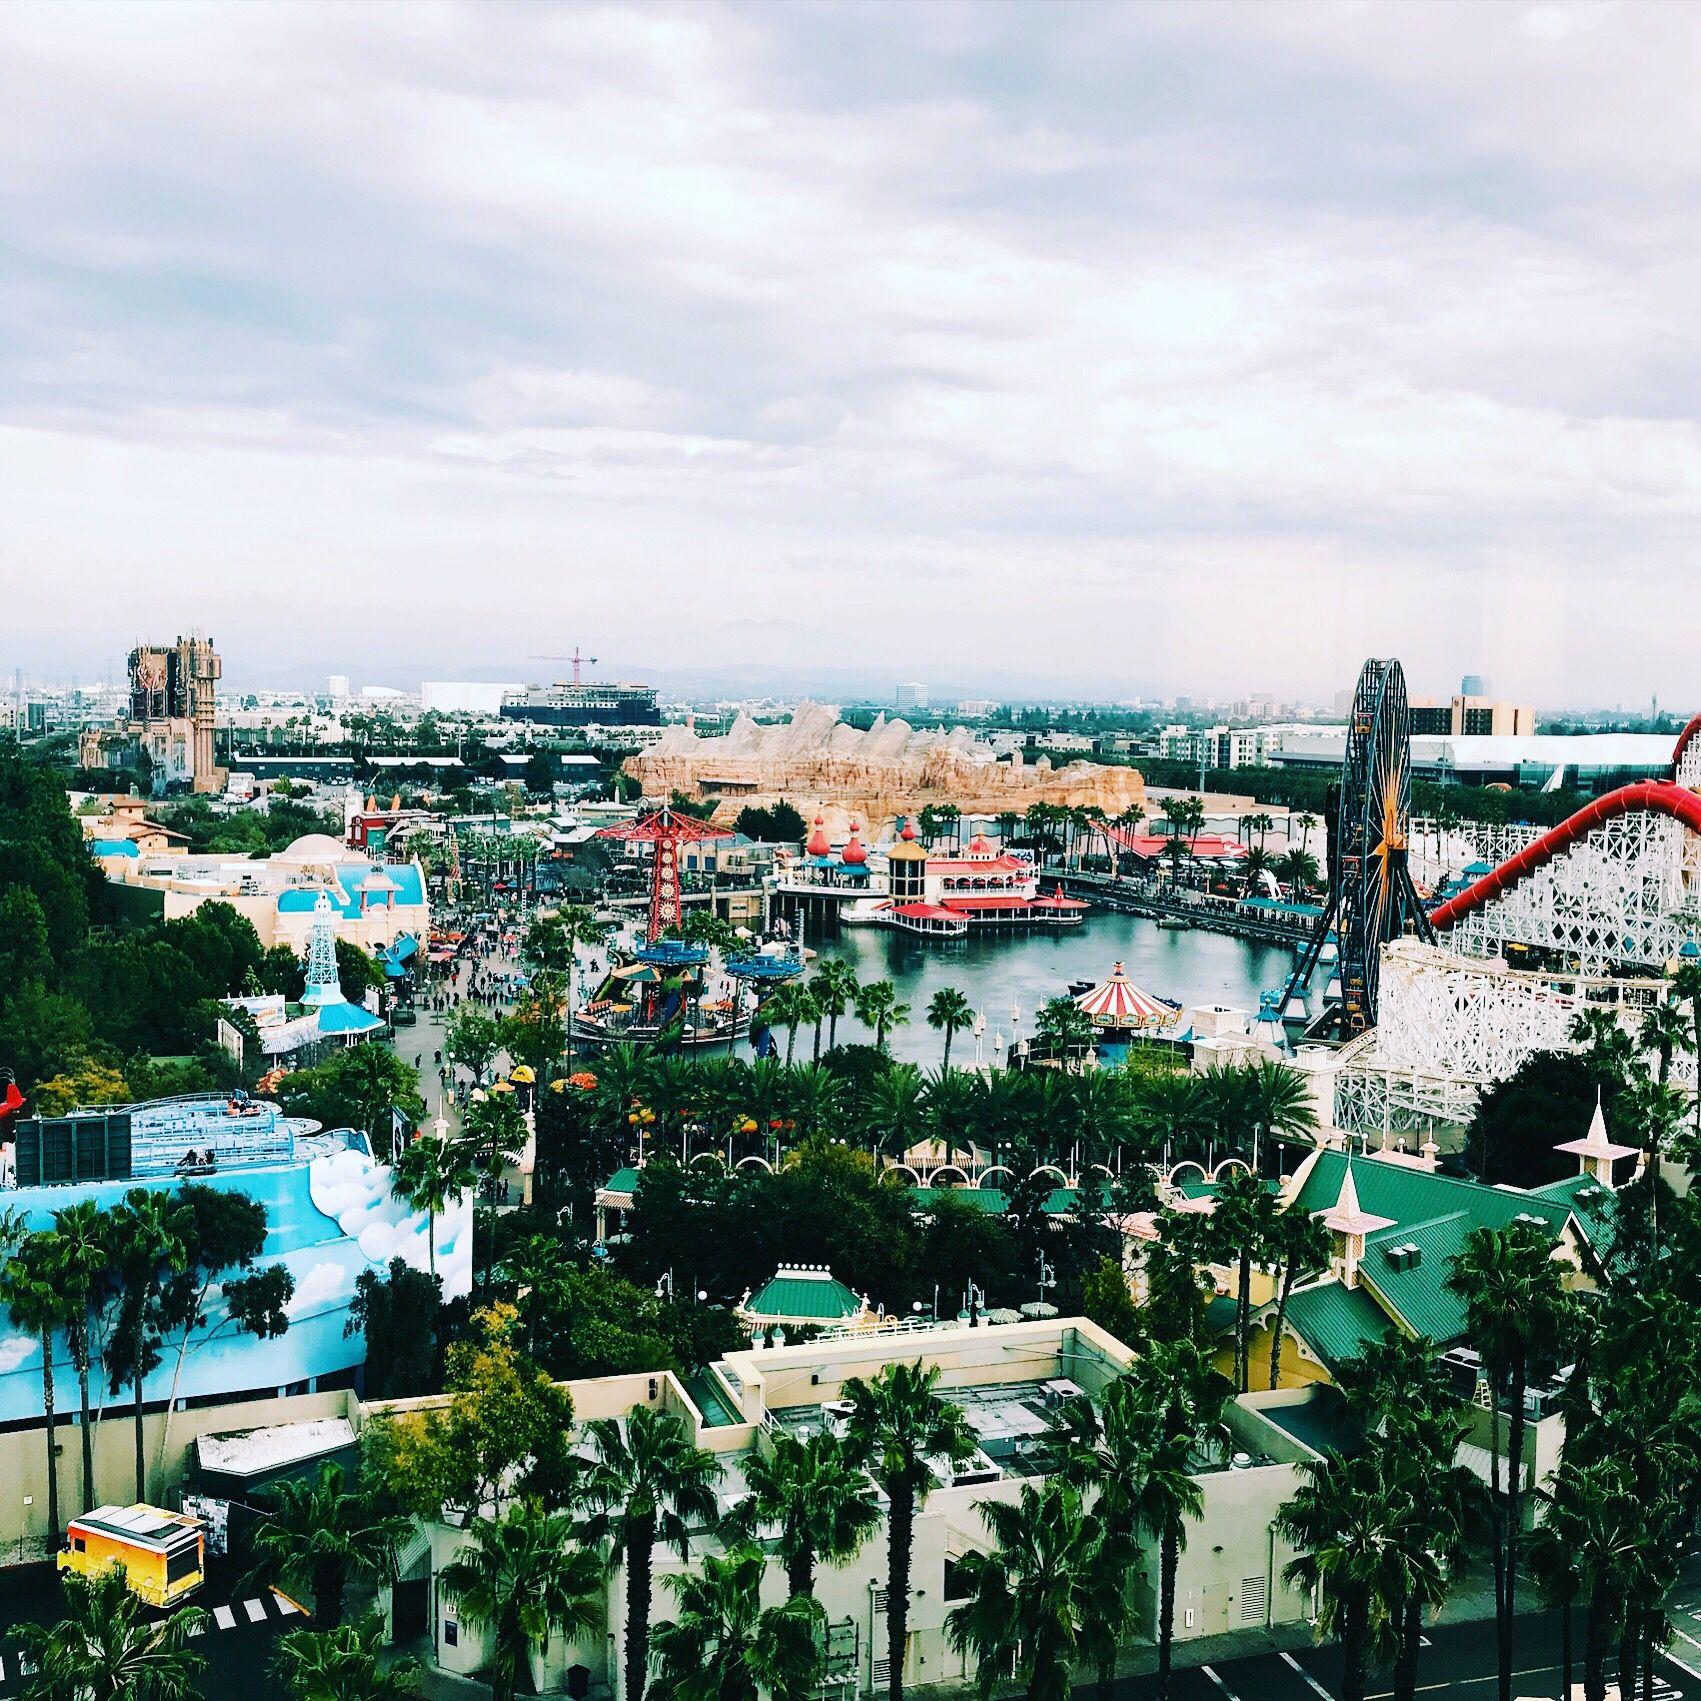 Paradise Pier Hotel Overlooks Disney California Adventure